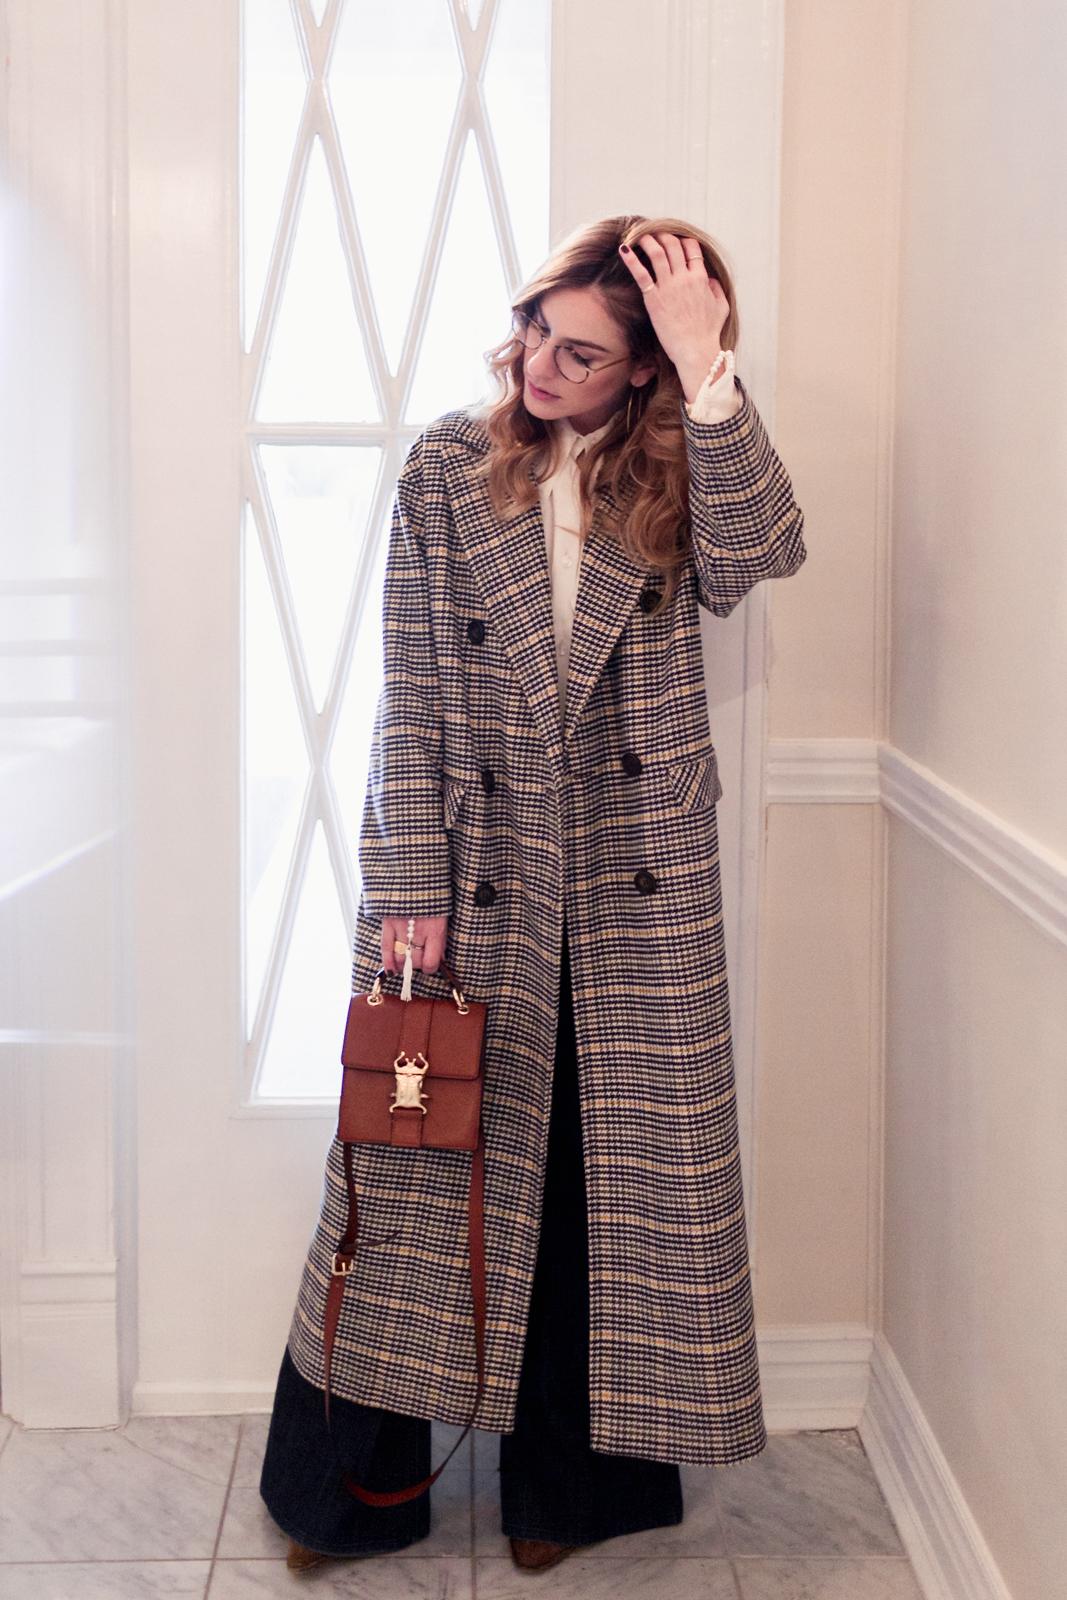 Eldridge Edit_anna_e_cottrell_fashion_blog_blogger_nordstrom_topshop_houndstooth_double_breasted_duster_coat_sale_topshop_garret_leight_glasses_thatch_lola_14k_gold_hoops_vintage_zara_bug_bag_mgb_photo_2.jpg